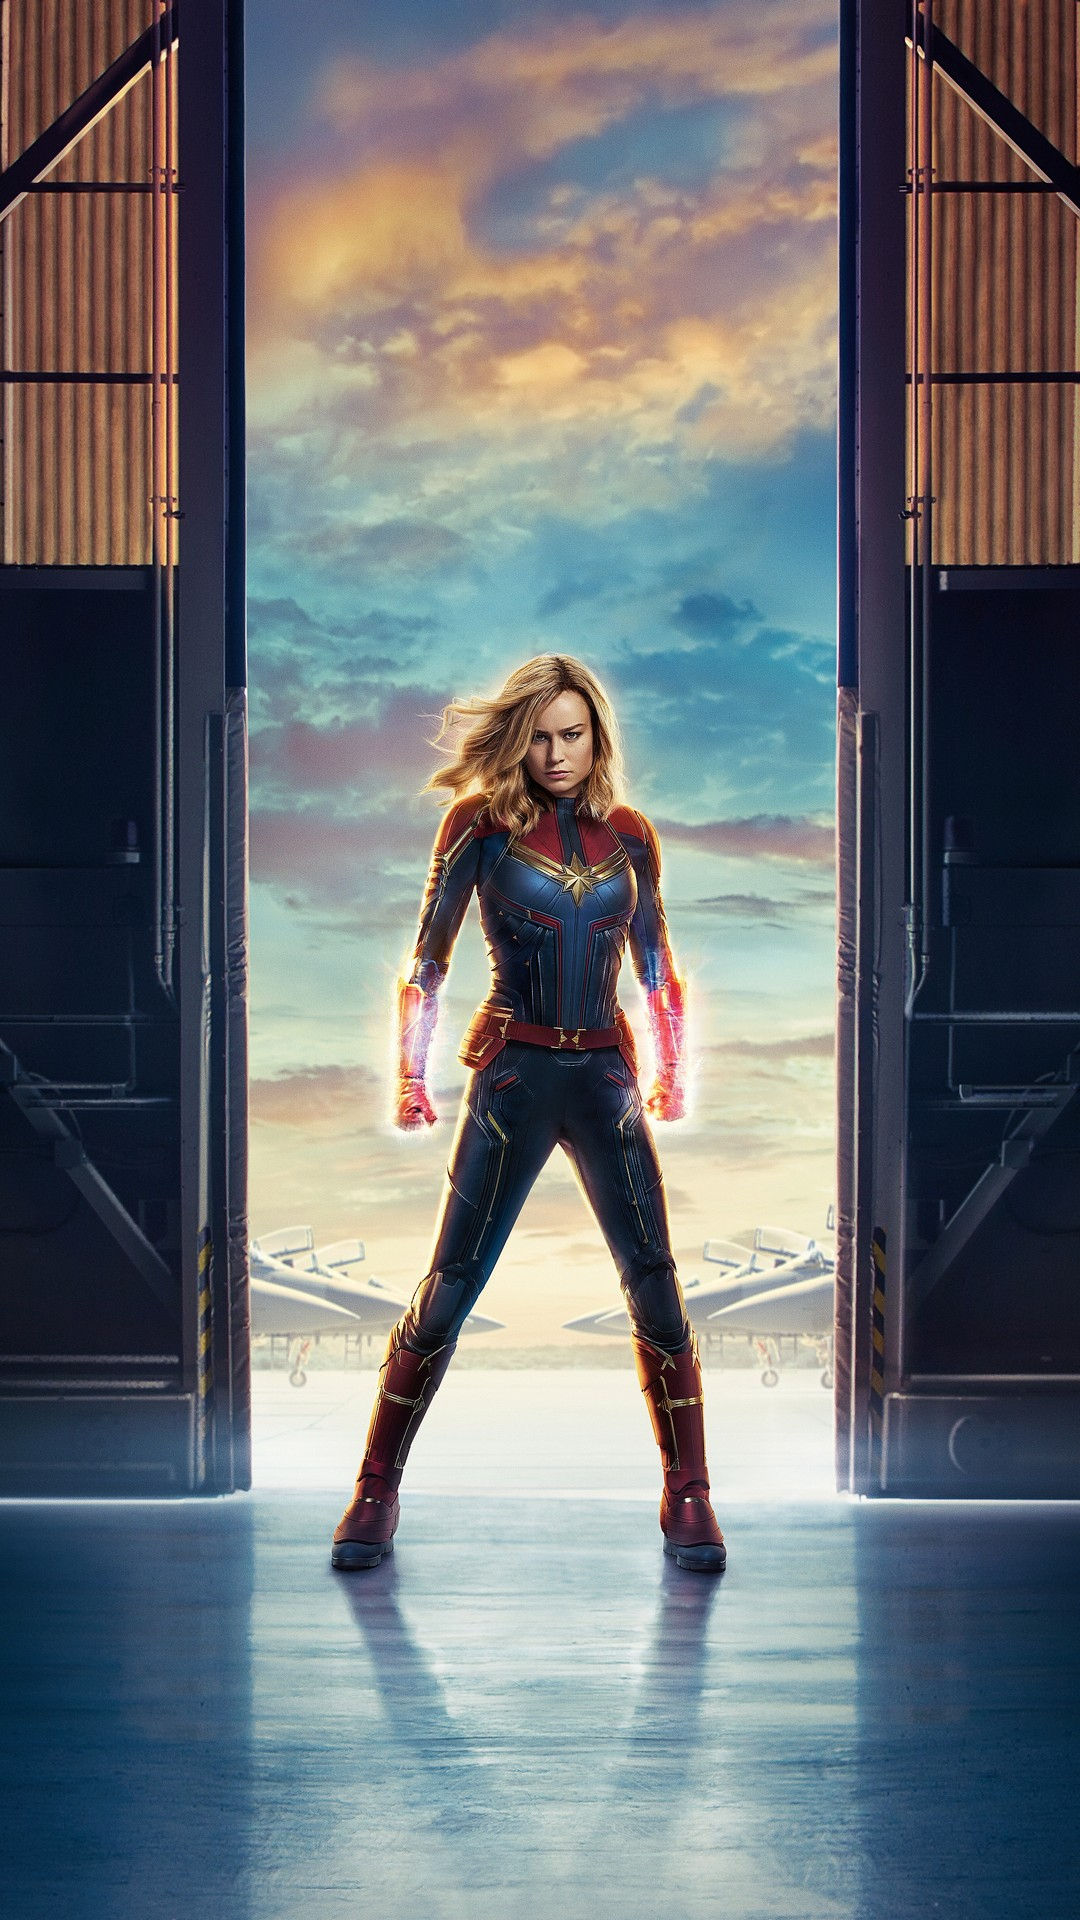 Captain Marvel Phone Wallpaper 2020 Cute Wallpapers 1080x1920